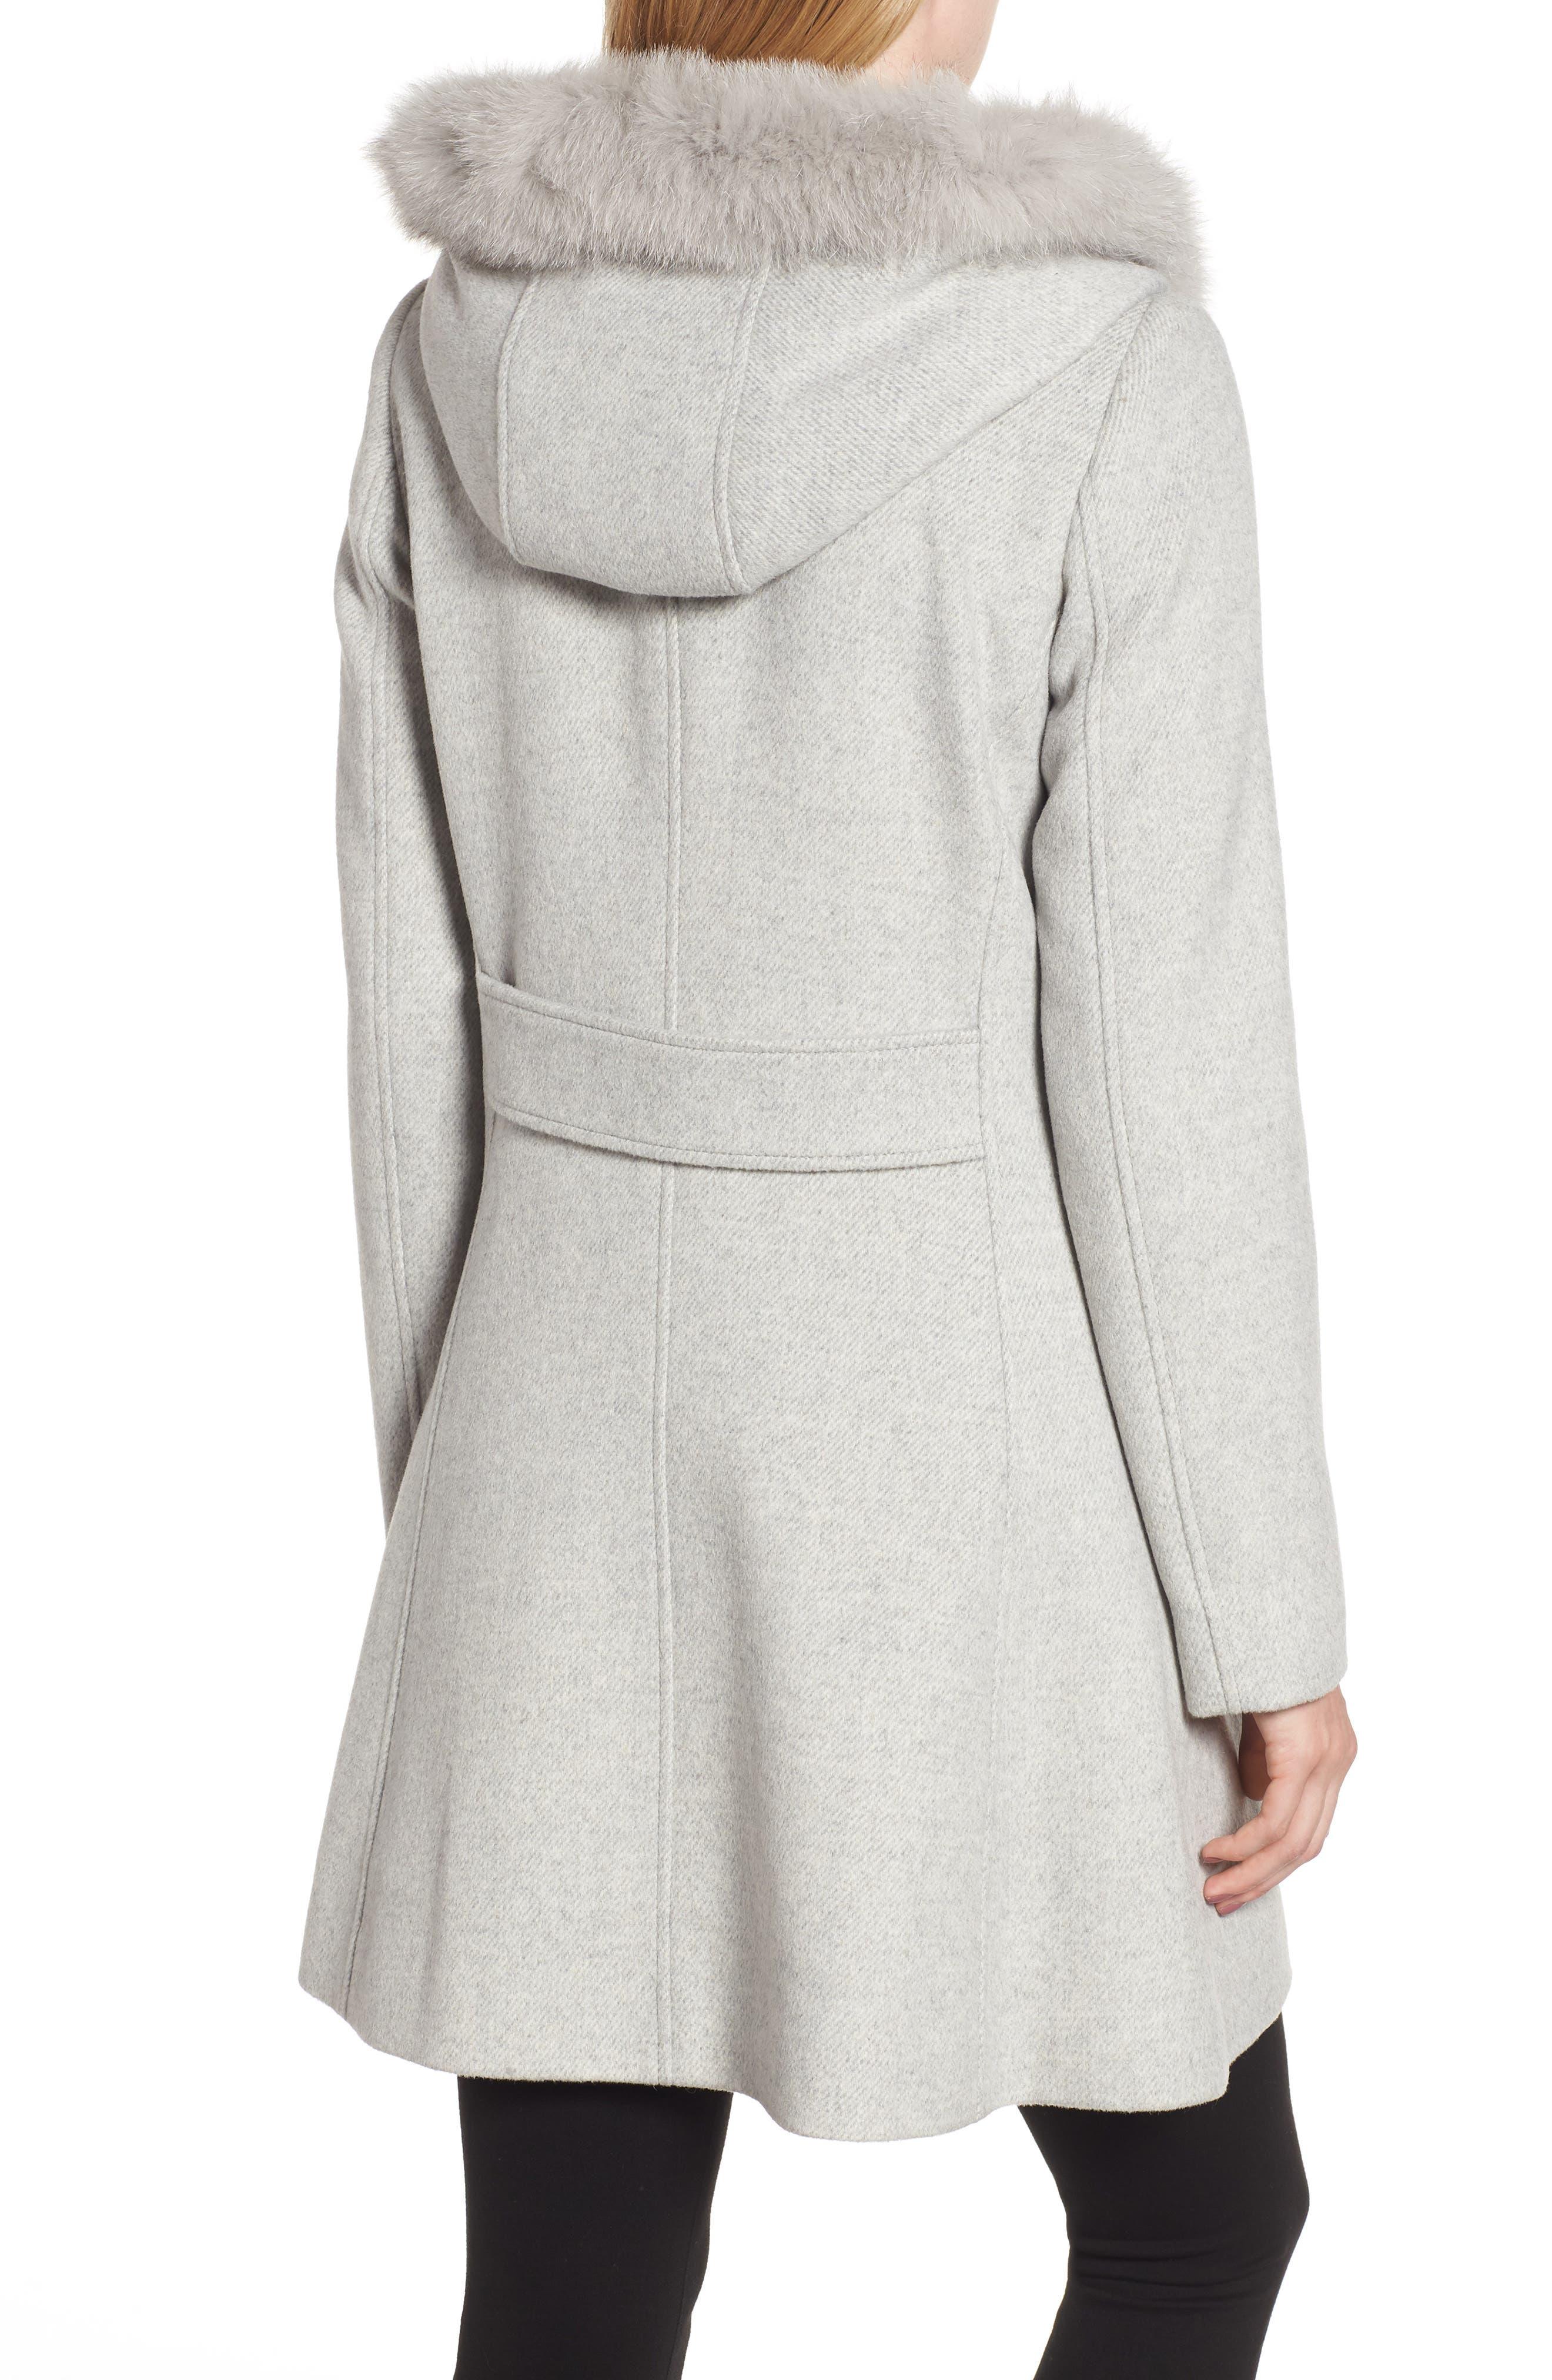 KRISTEN BLAKE,                             Genuine Fox Trim Hooded Wool Coat,                             Alternate thumbnail 2, color,                             GREY MELANGE